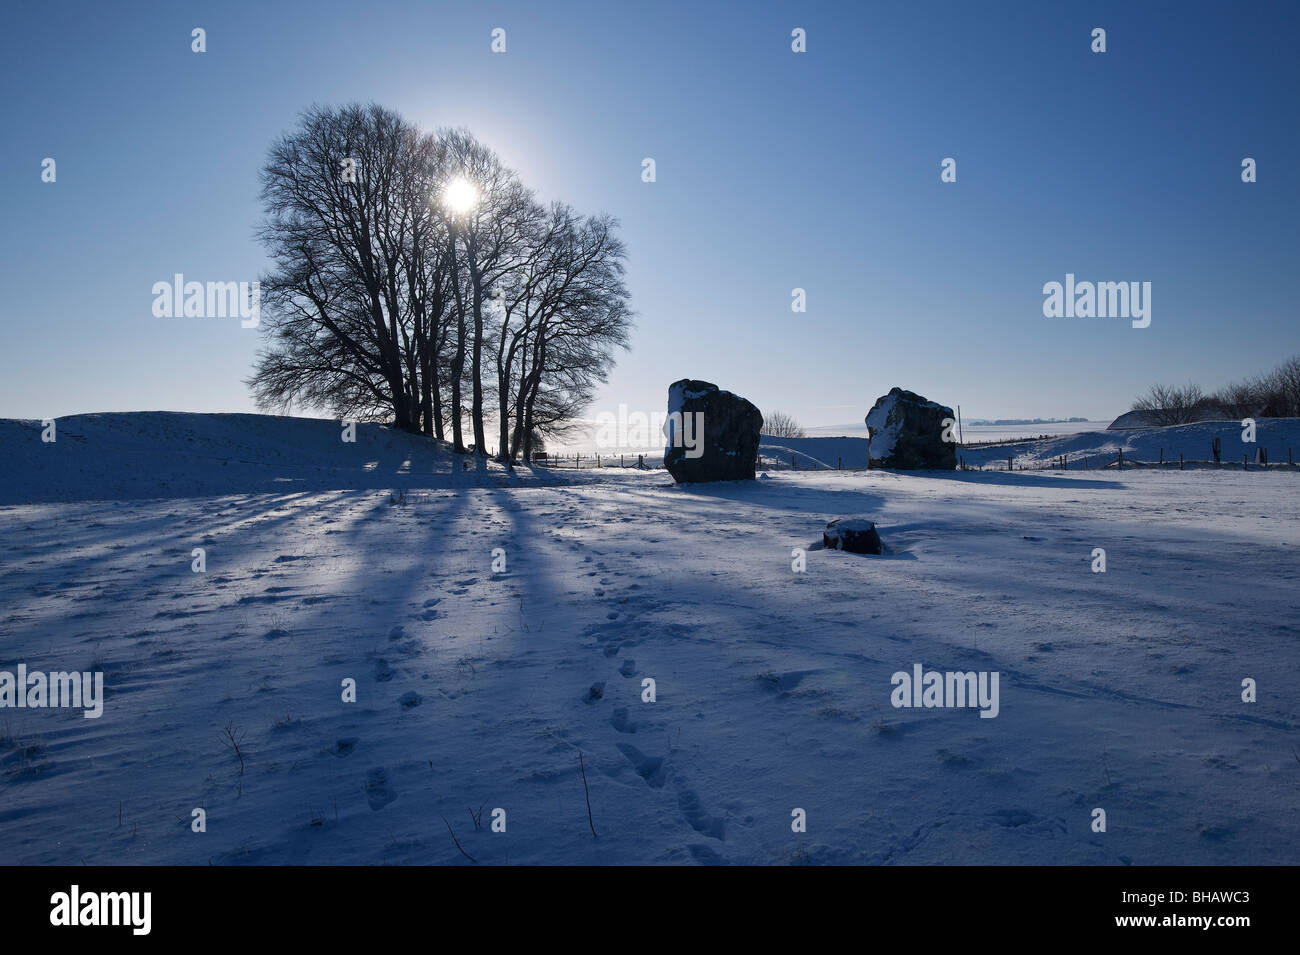 Averbury In the Snow - Stock Image